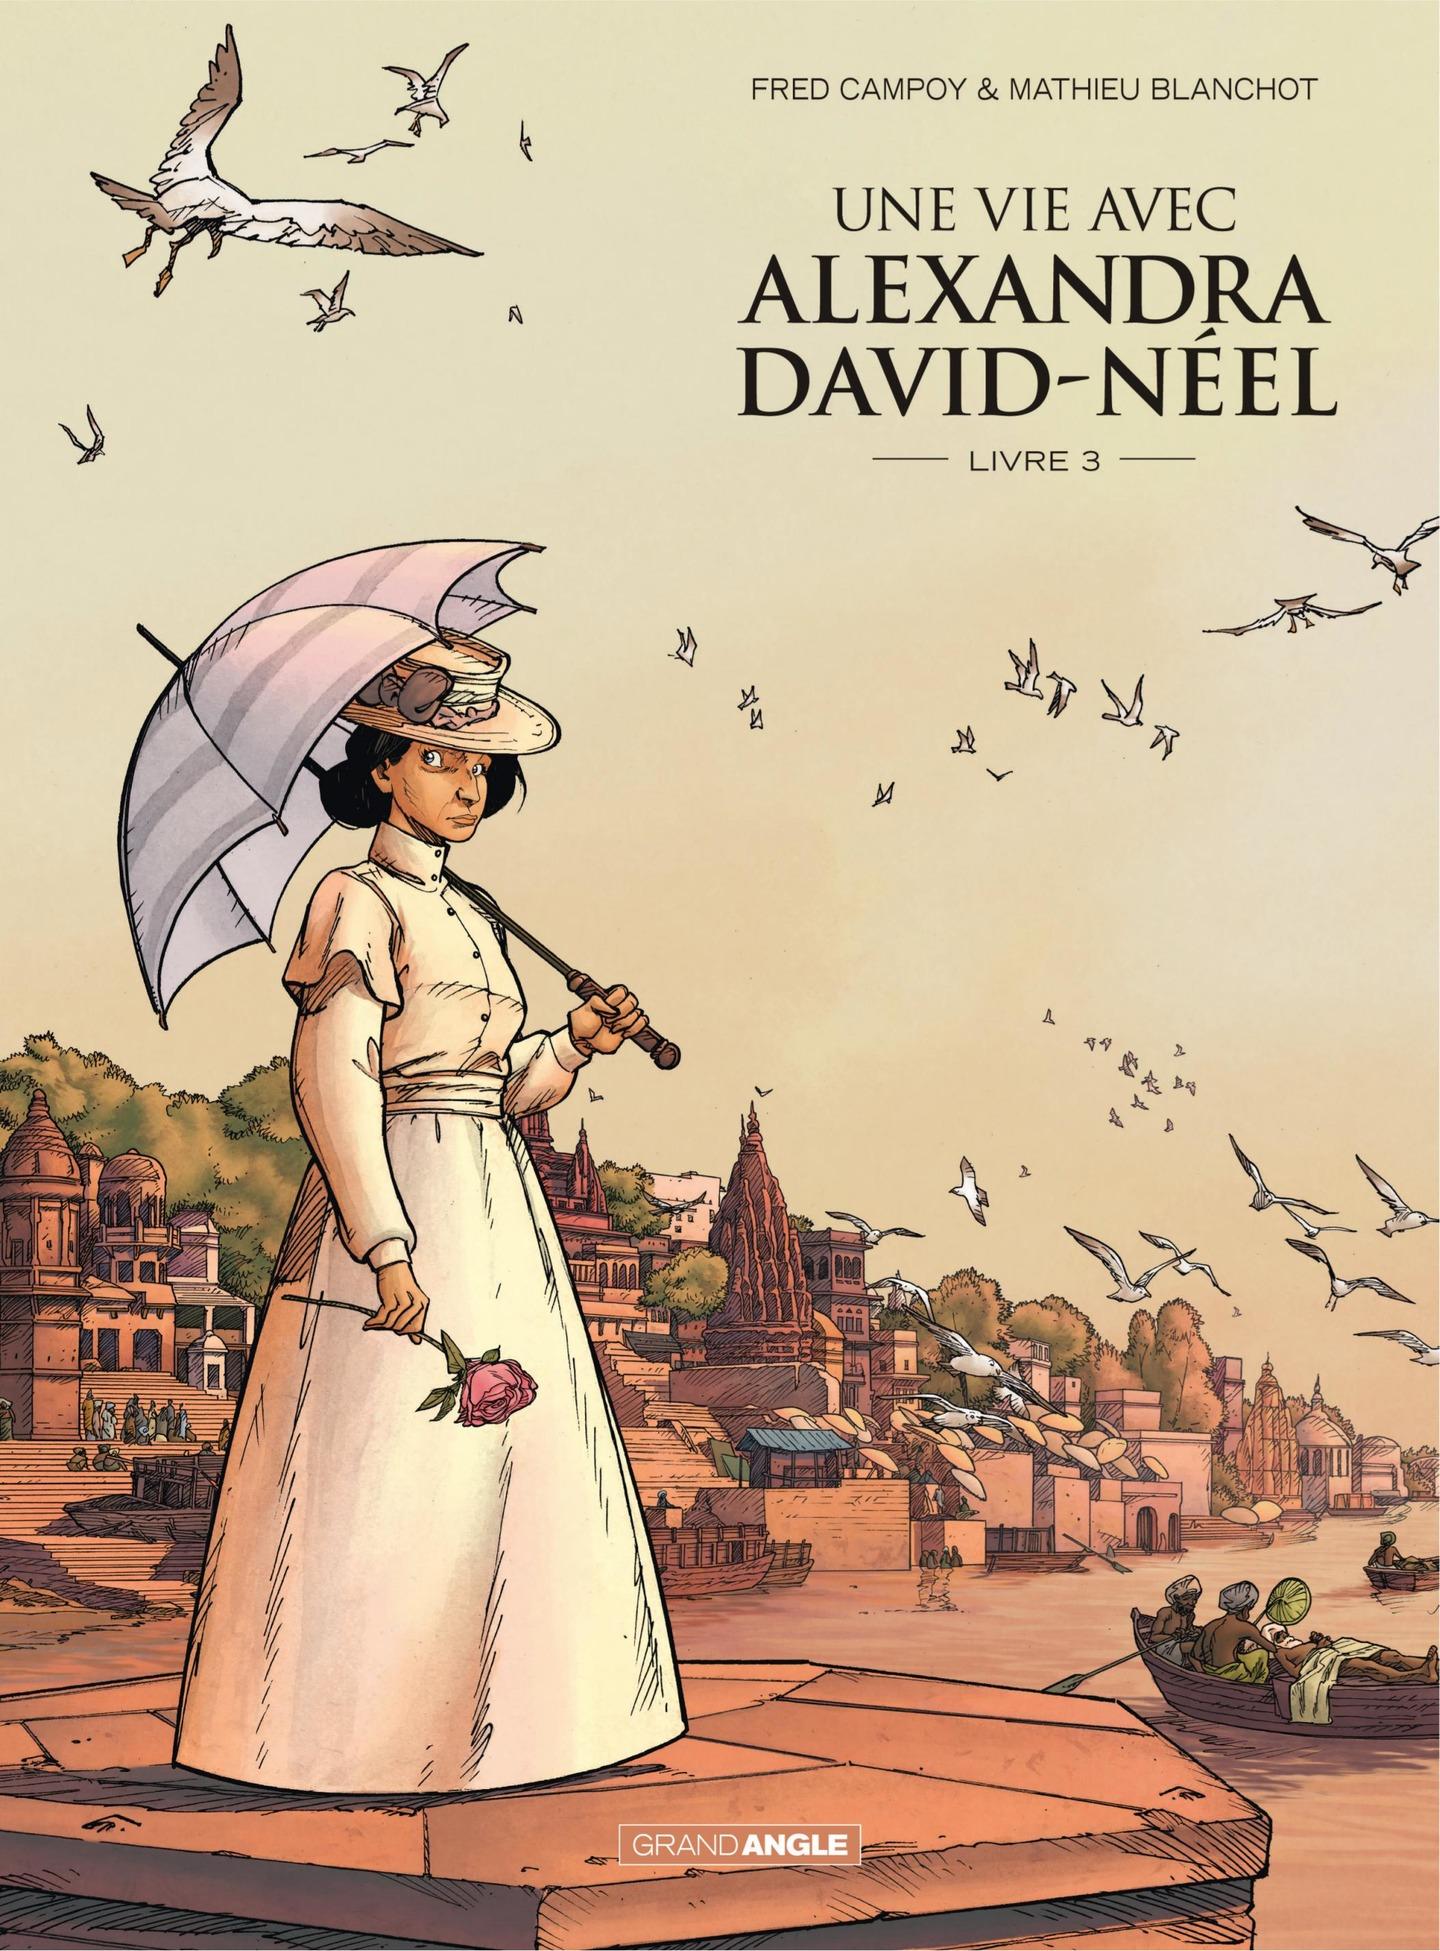 Une vie avec Alexandra David-Néel - Livre 3